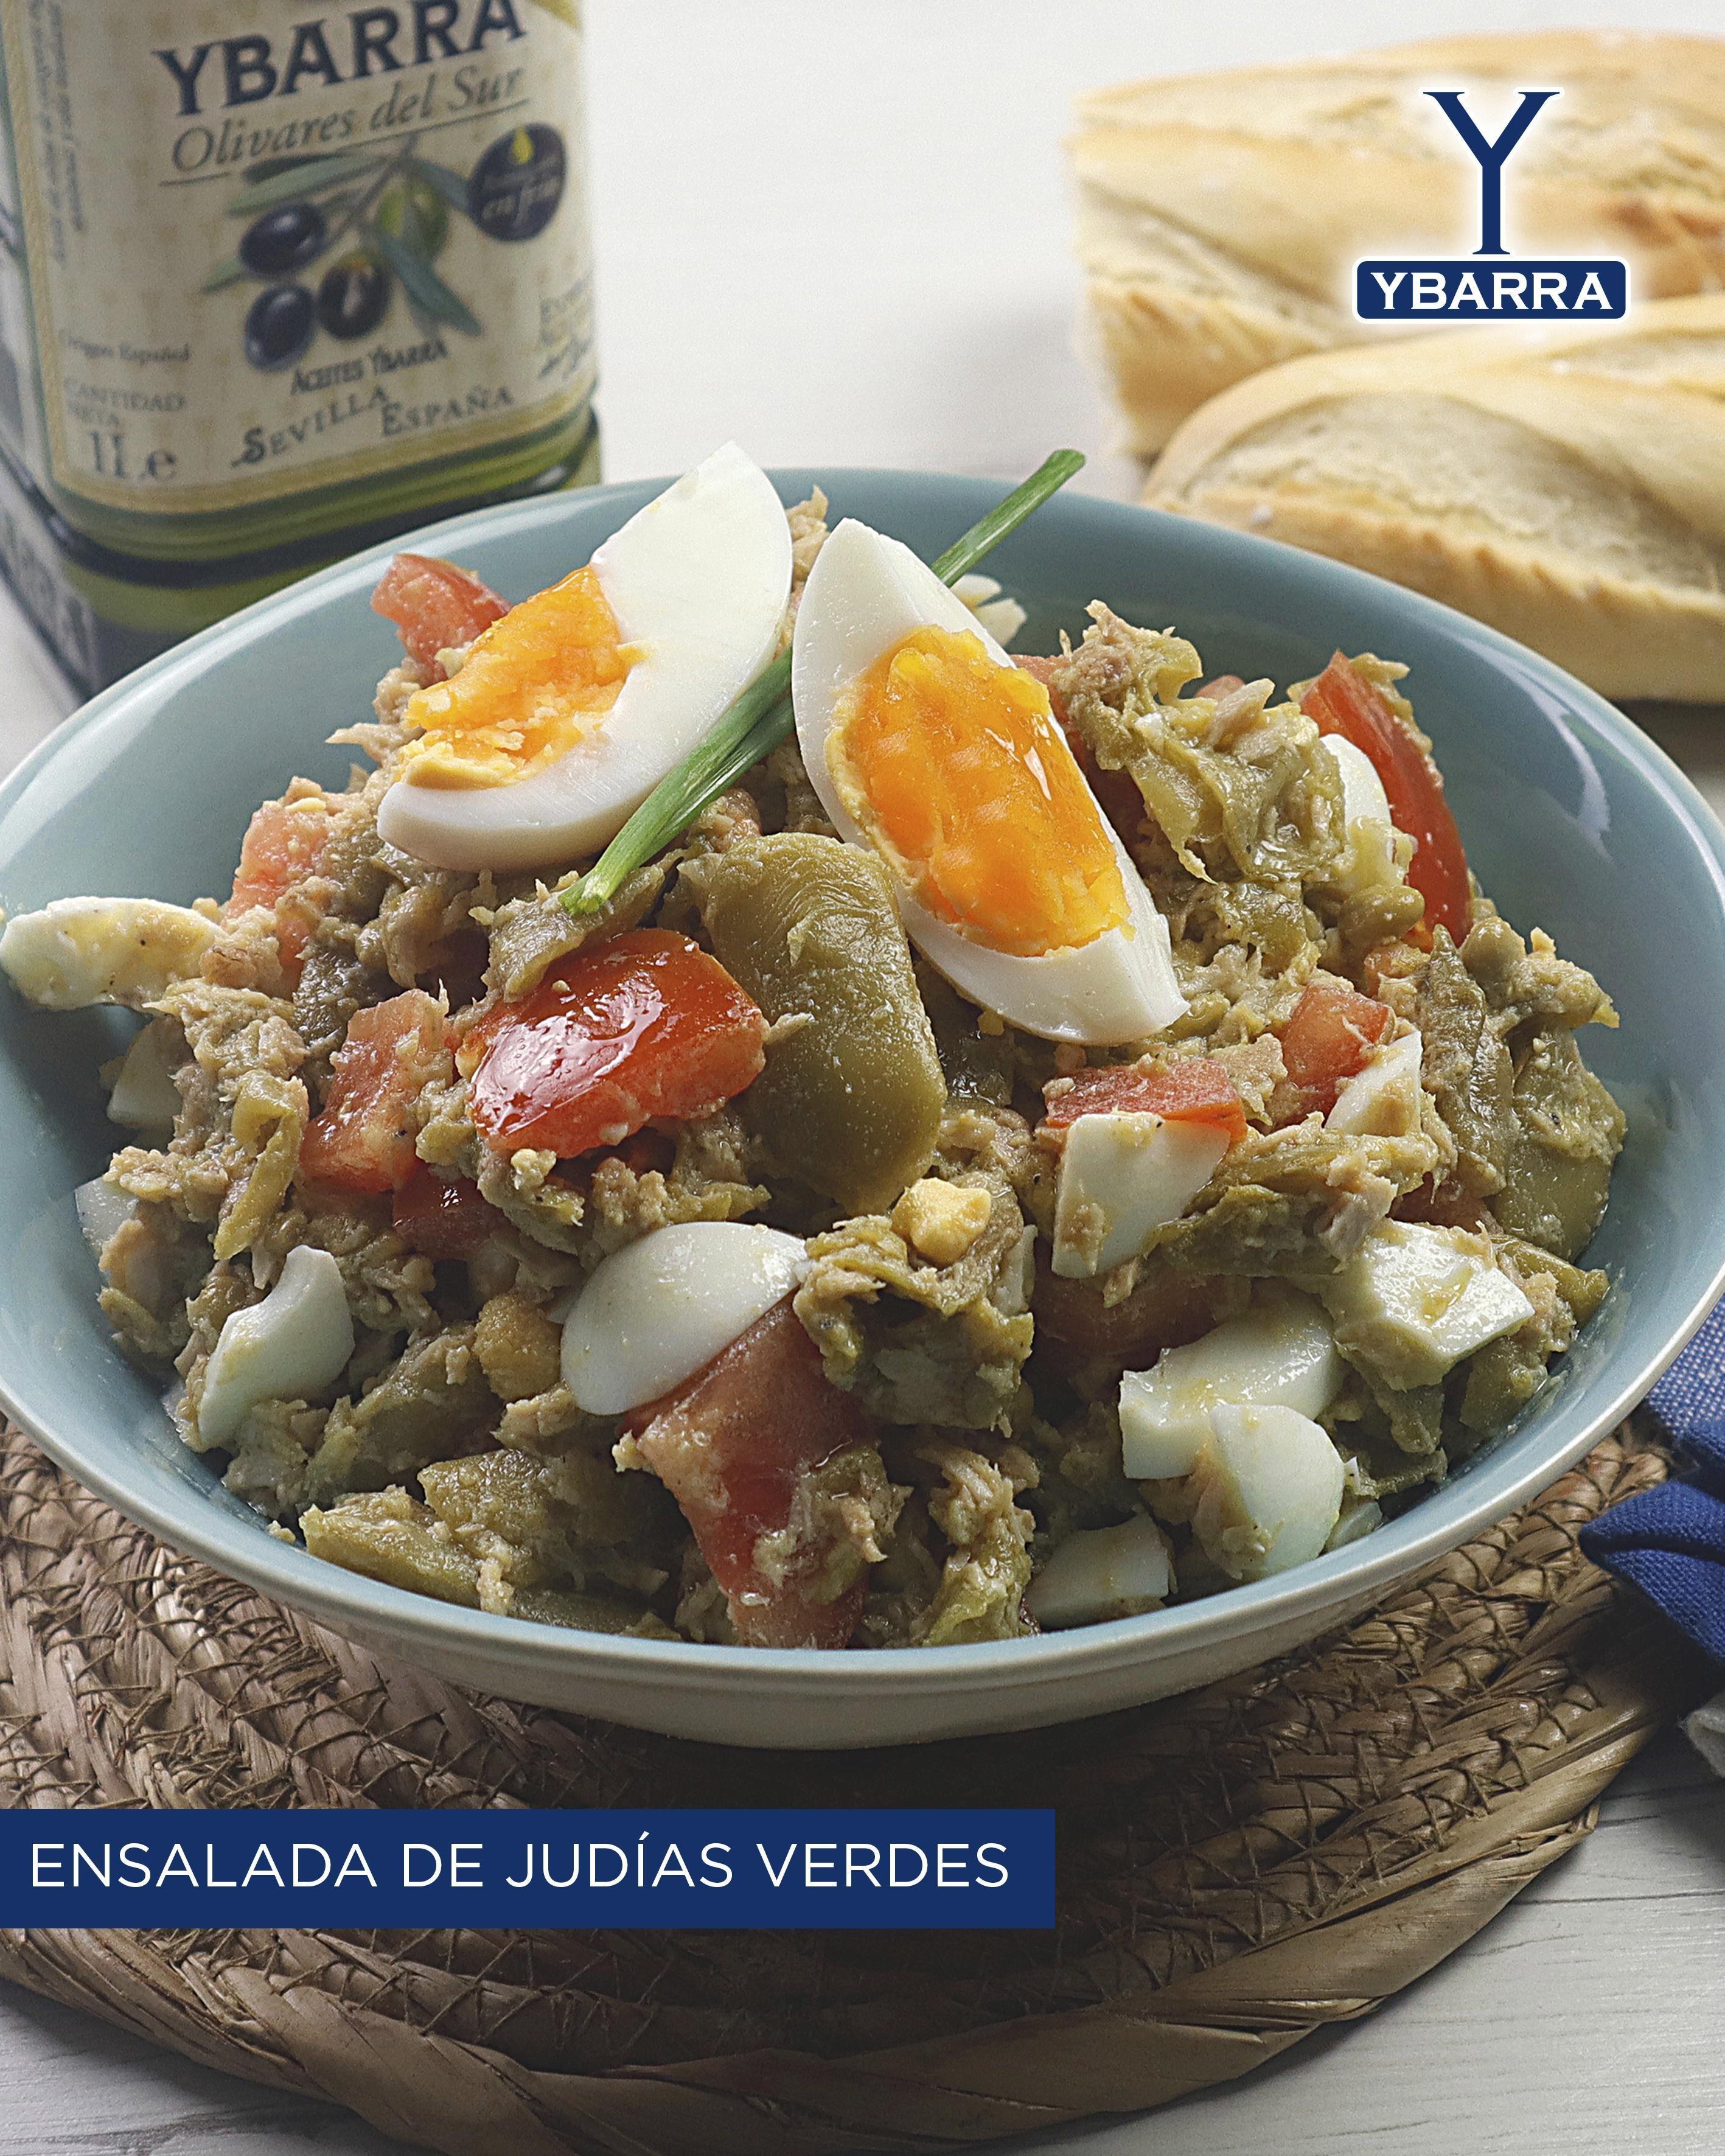 Comidas Saludables Sin Verduras Recetas Fáciles Ensalada Judias Verdes Vegan Recipes Healthy Smoked Sausage Casserole Recipes